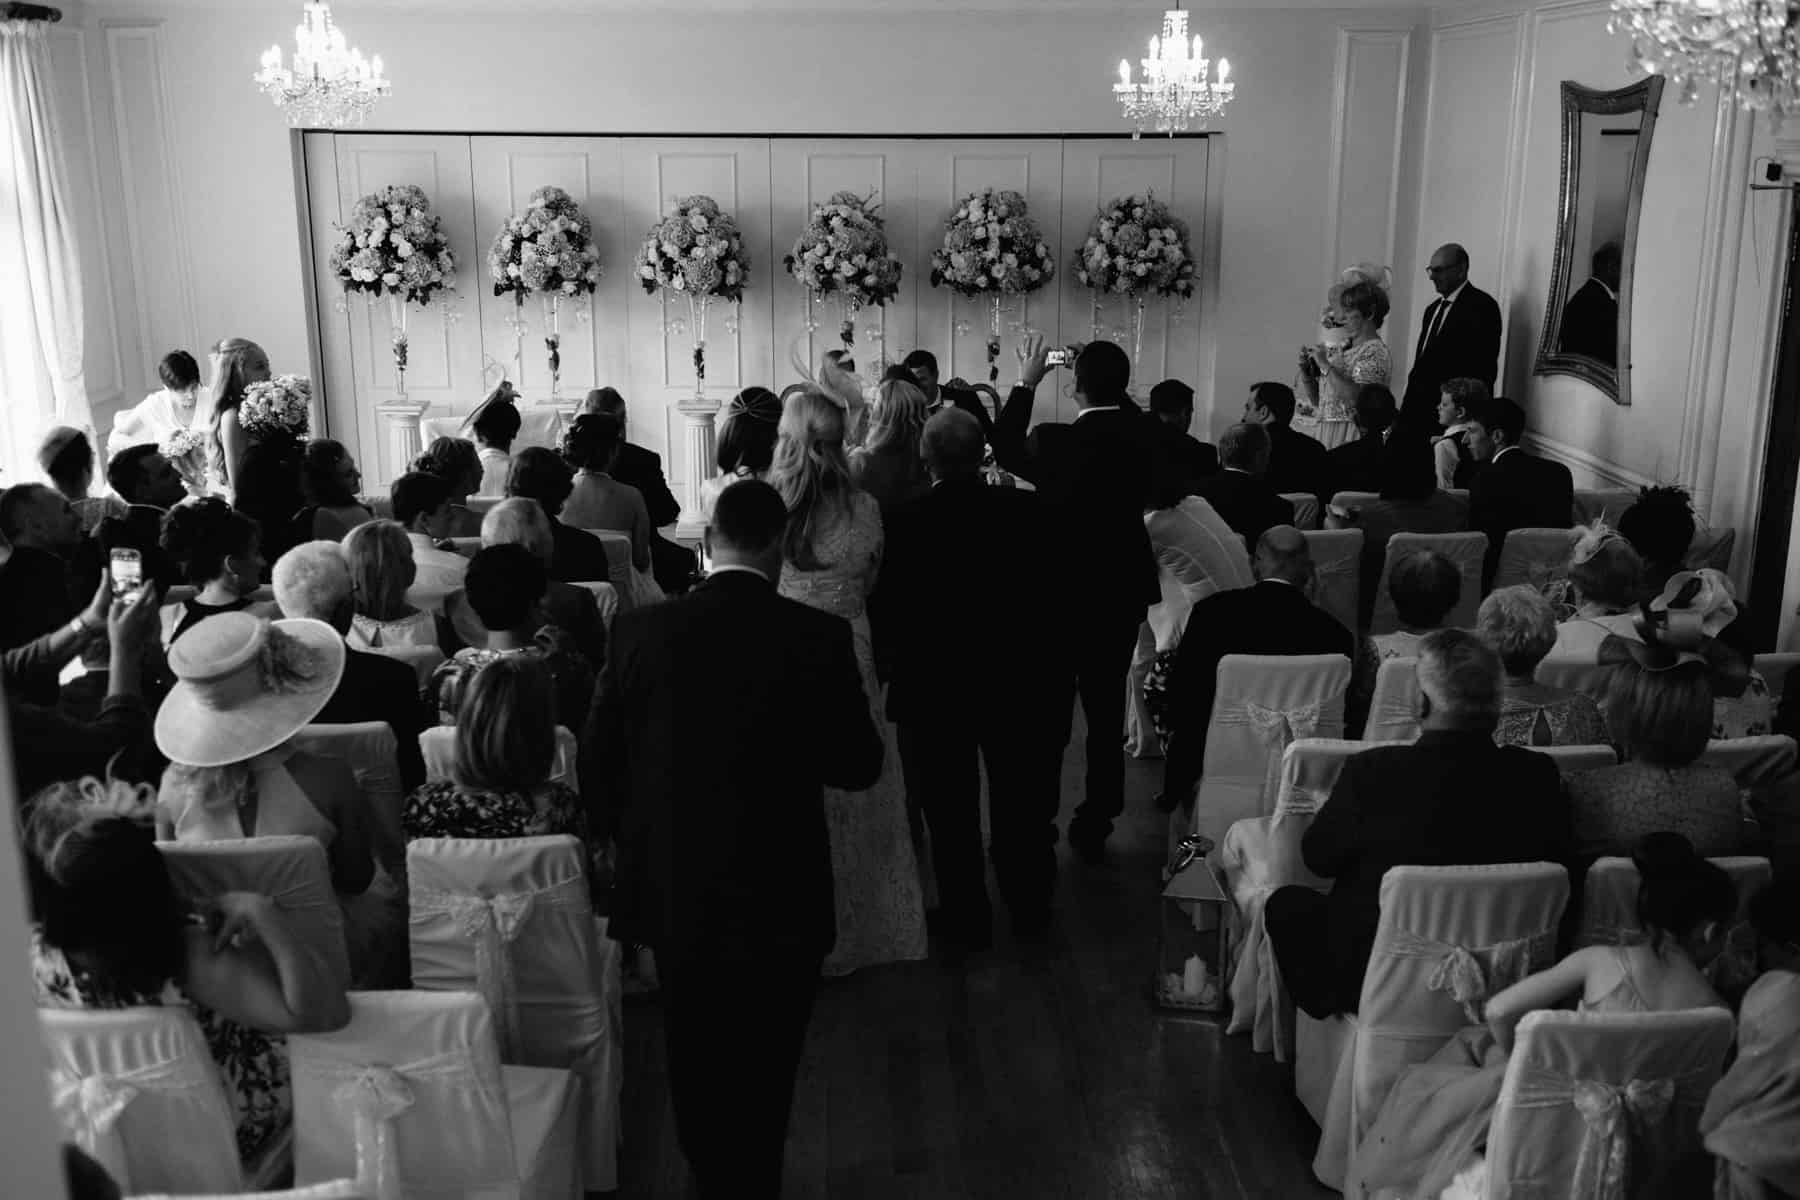 wedding photography signing register (1 of 1)